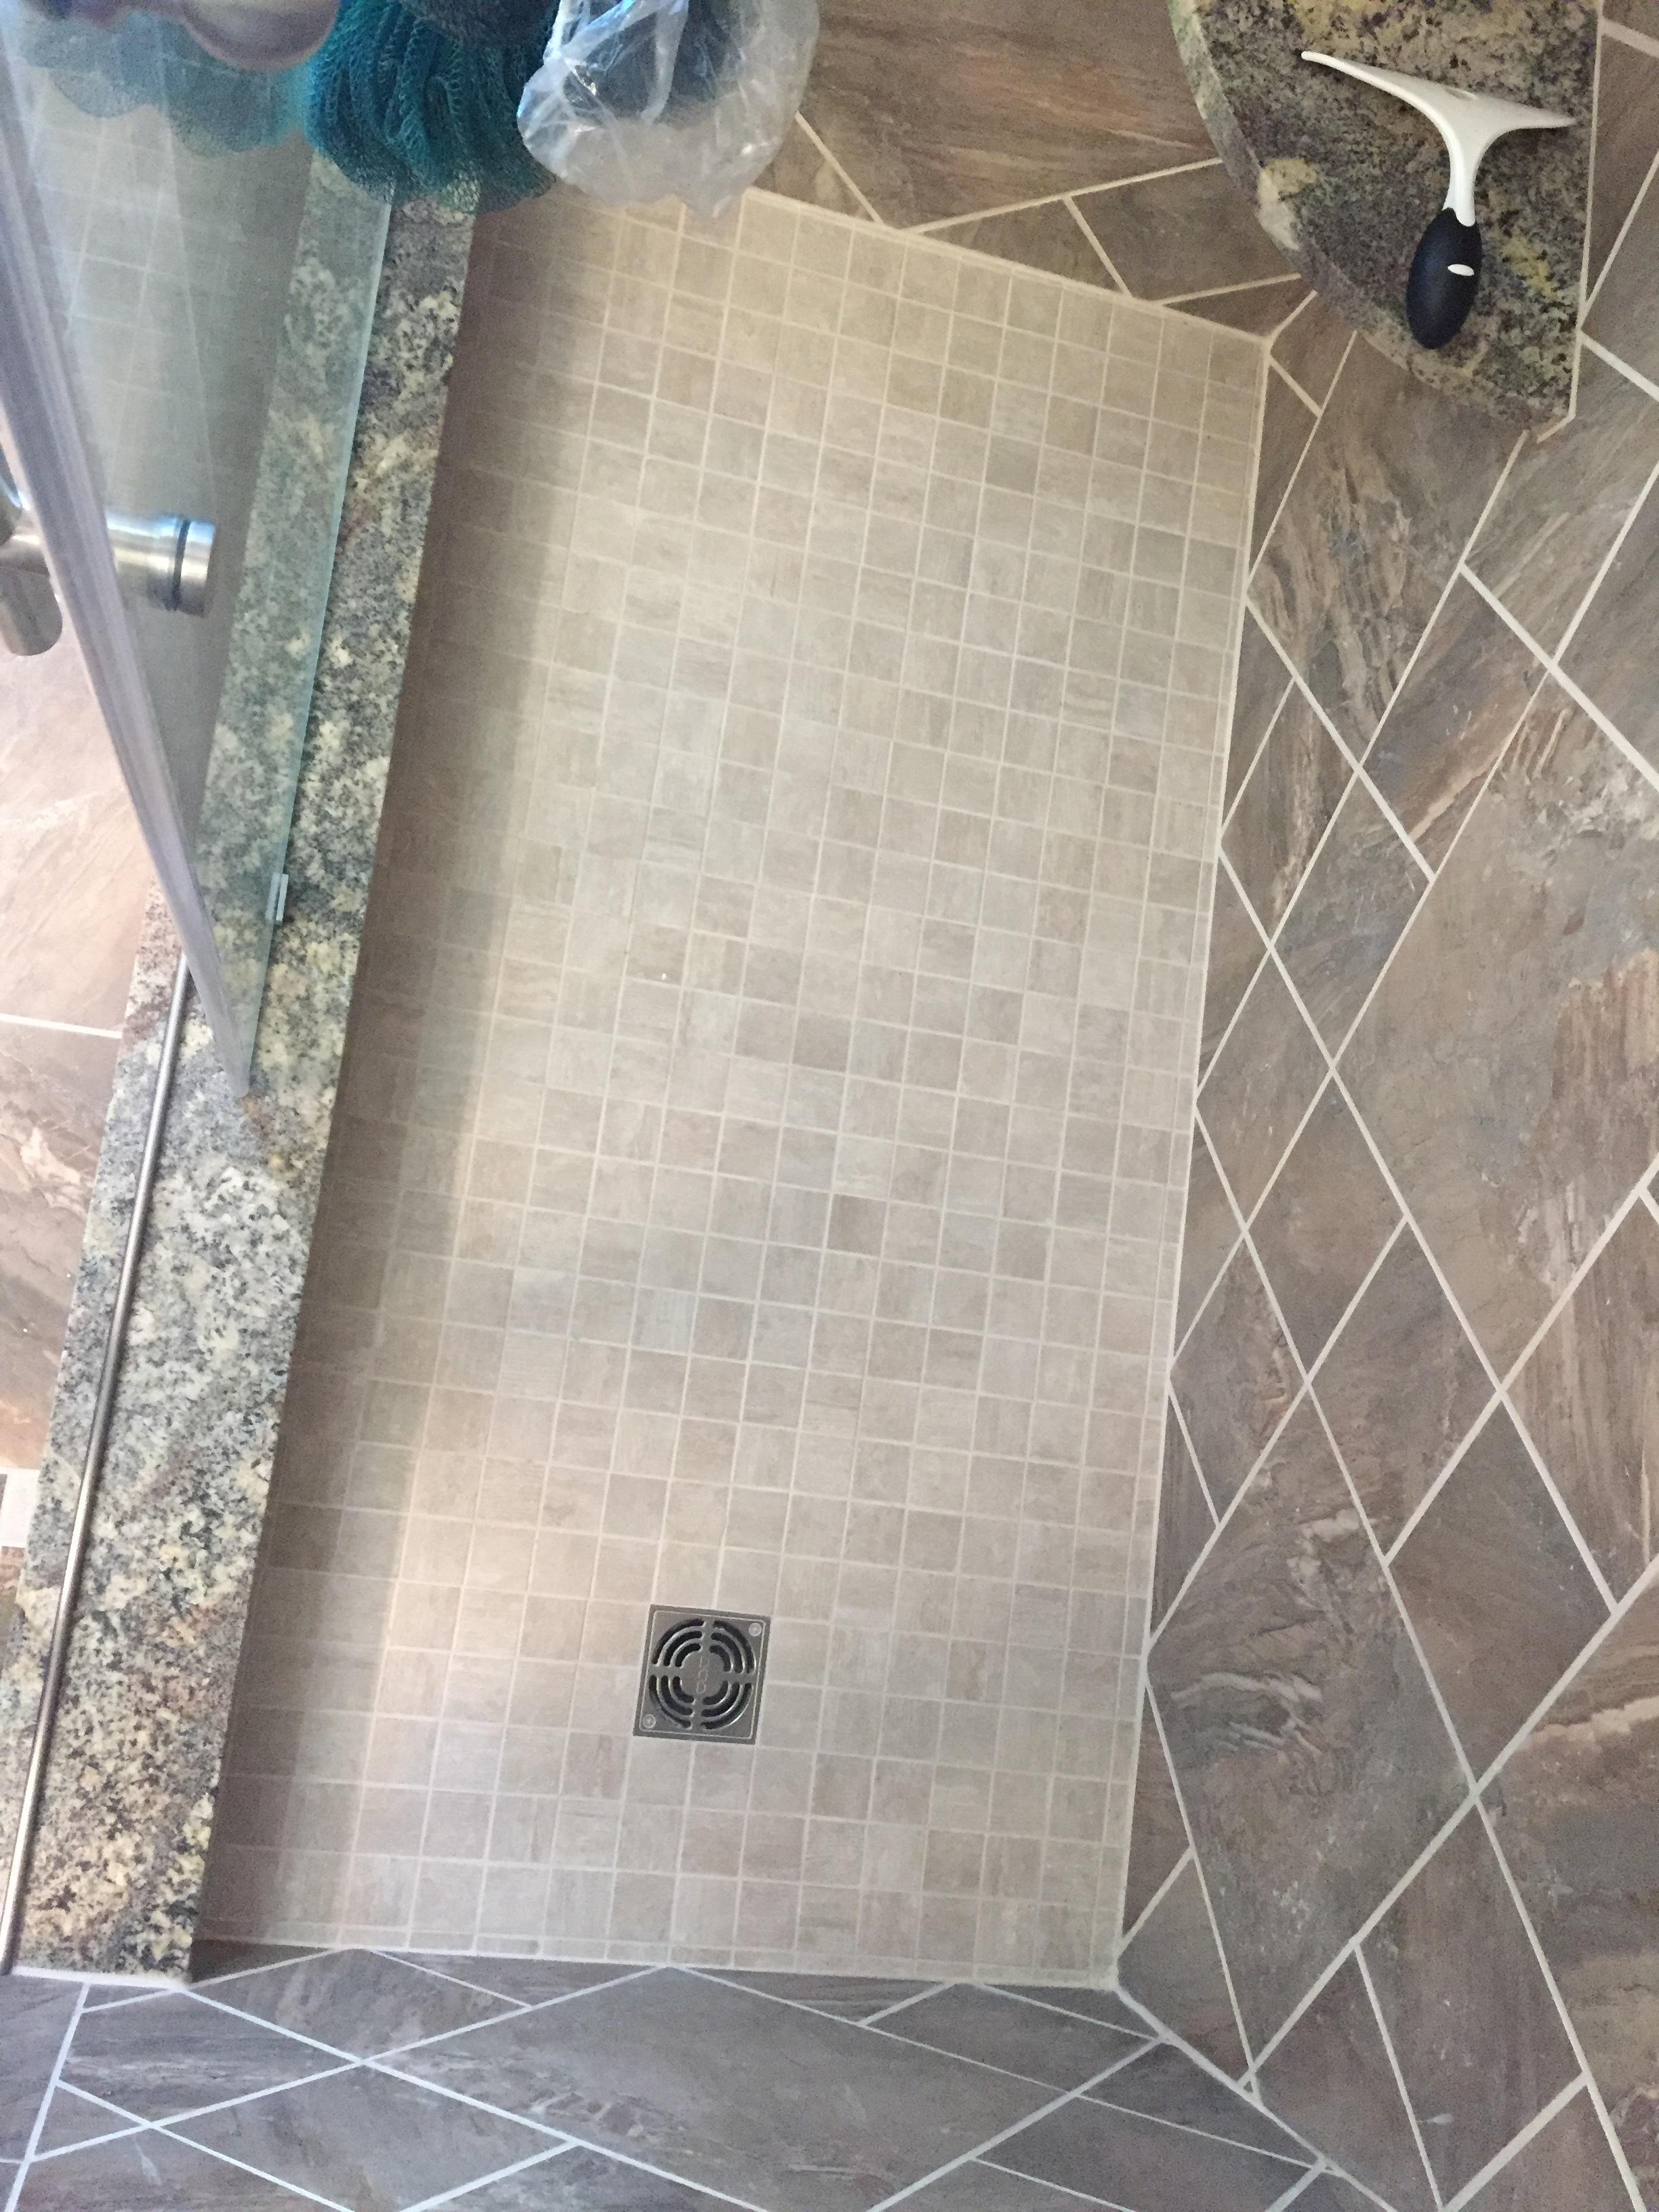 Shower Floor - After